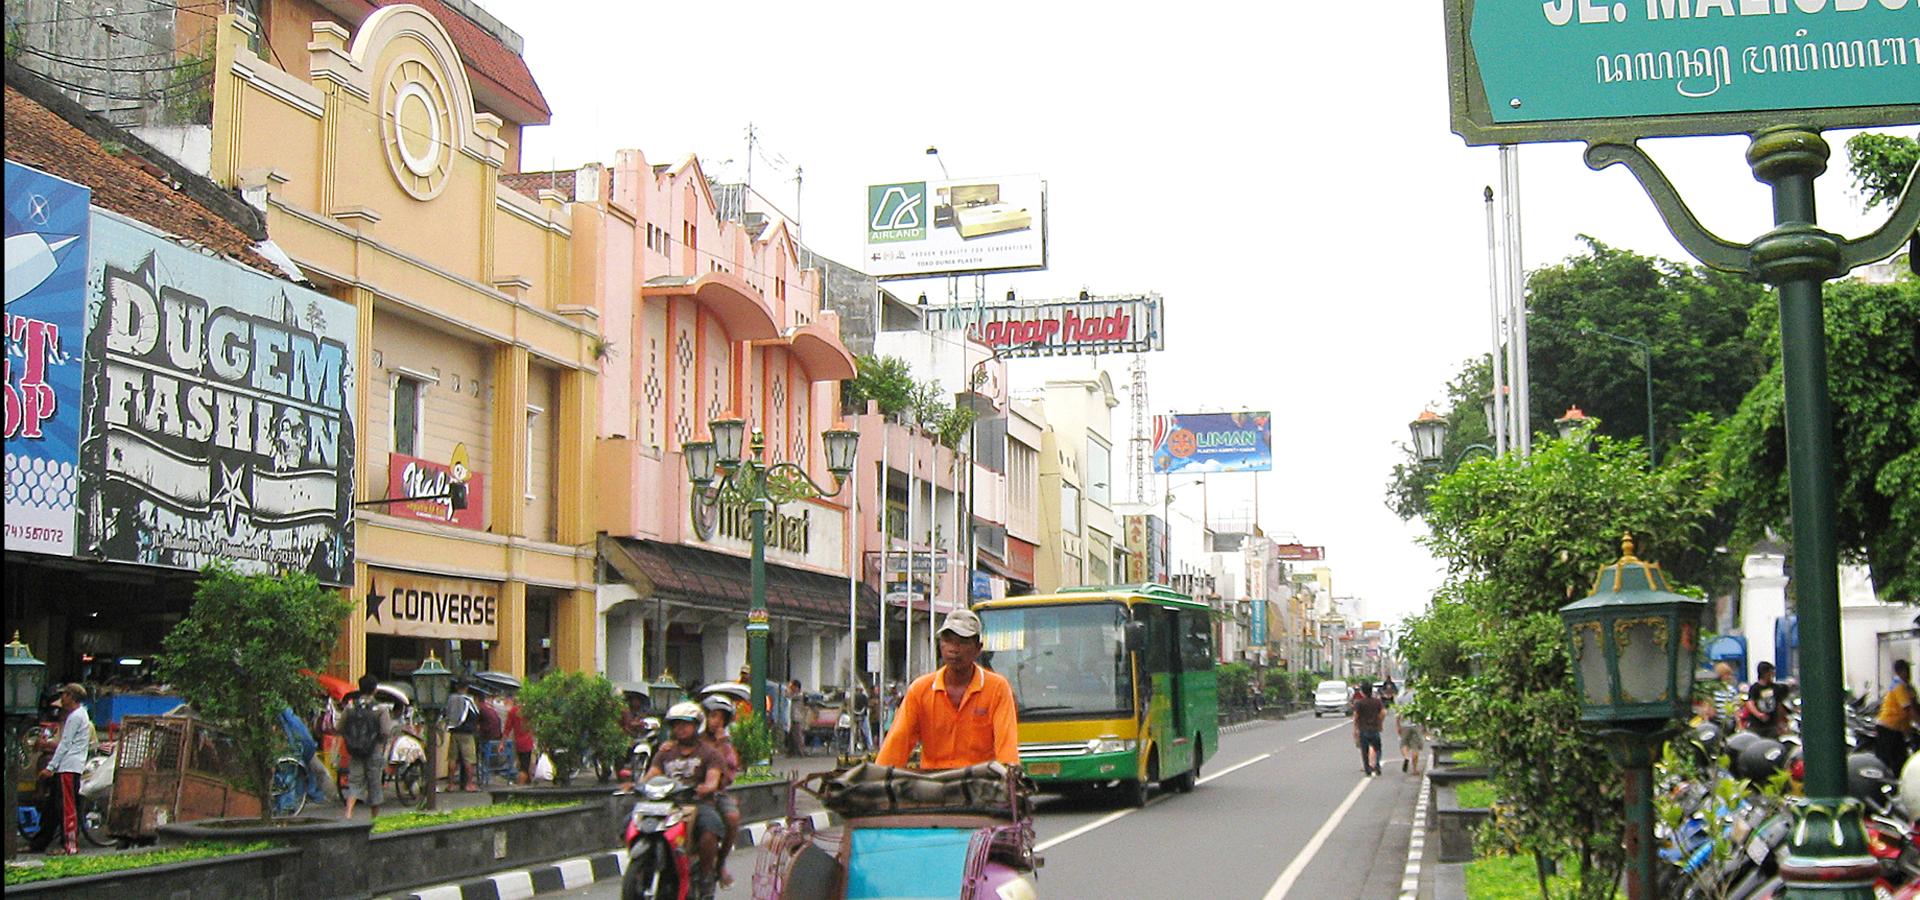 Peer-to-peer advisory in Yogyakarta, Special Region of Yogyakarta, Java, Indonesia